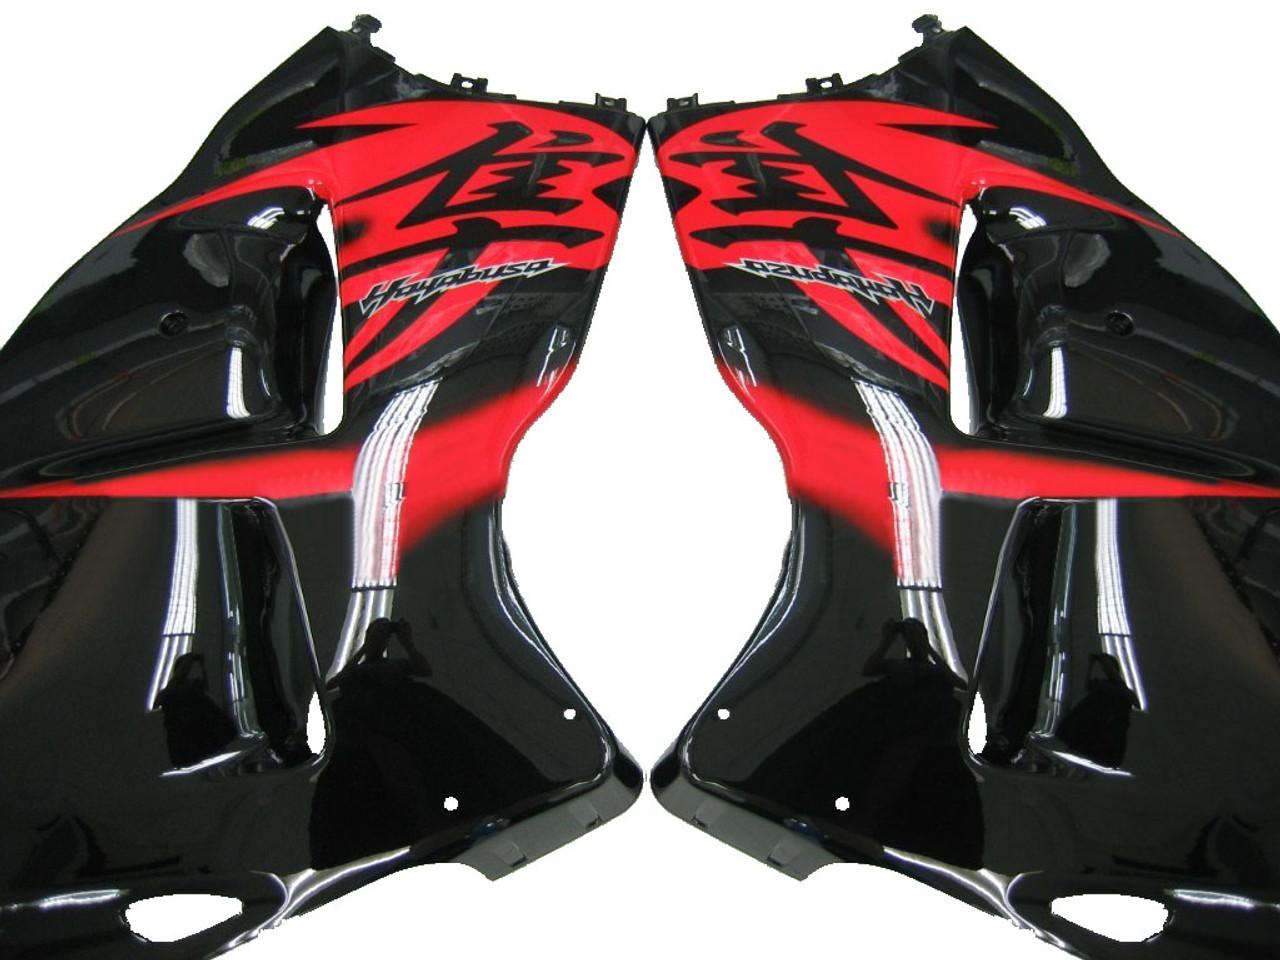 Fairings Suzuki GSX1300 Hayabusa Black and Red Hayabusa Racing  (1999-2007)